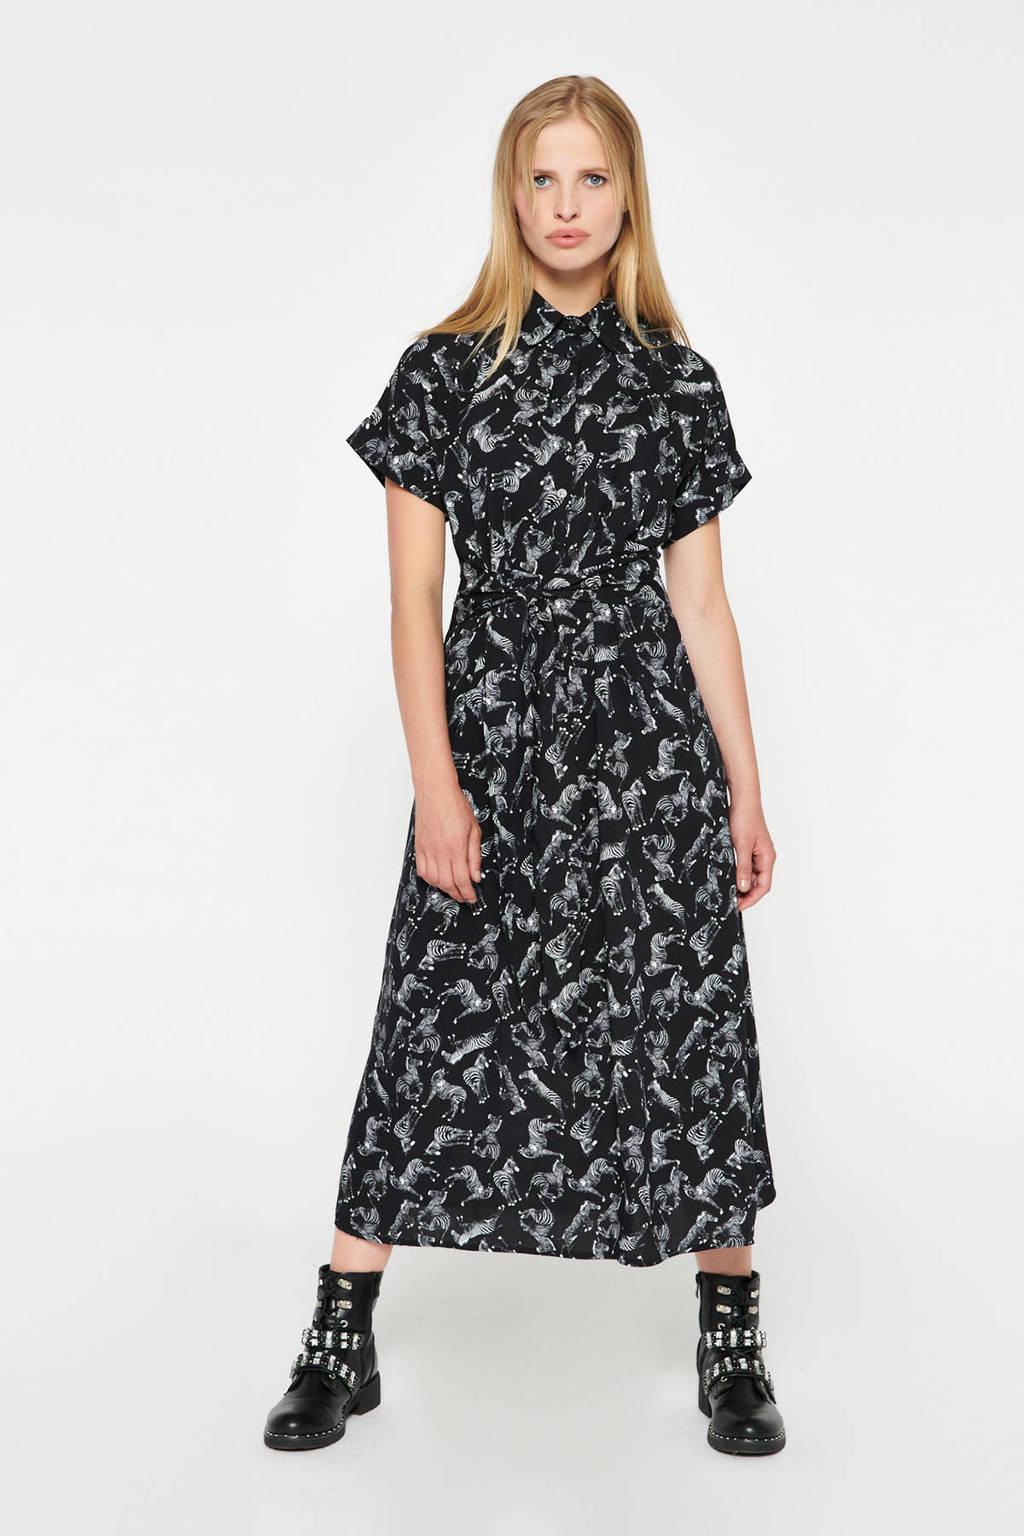 LOLALIZA blousejurk met dierenprint en ceintuur zwart/wit, Zwart/wit